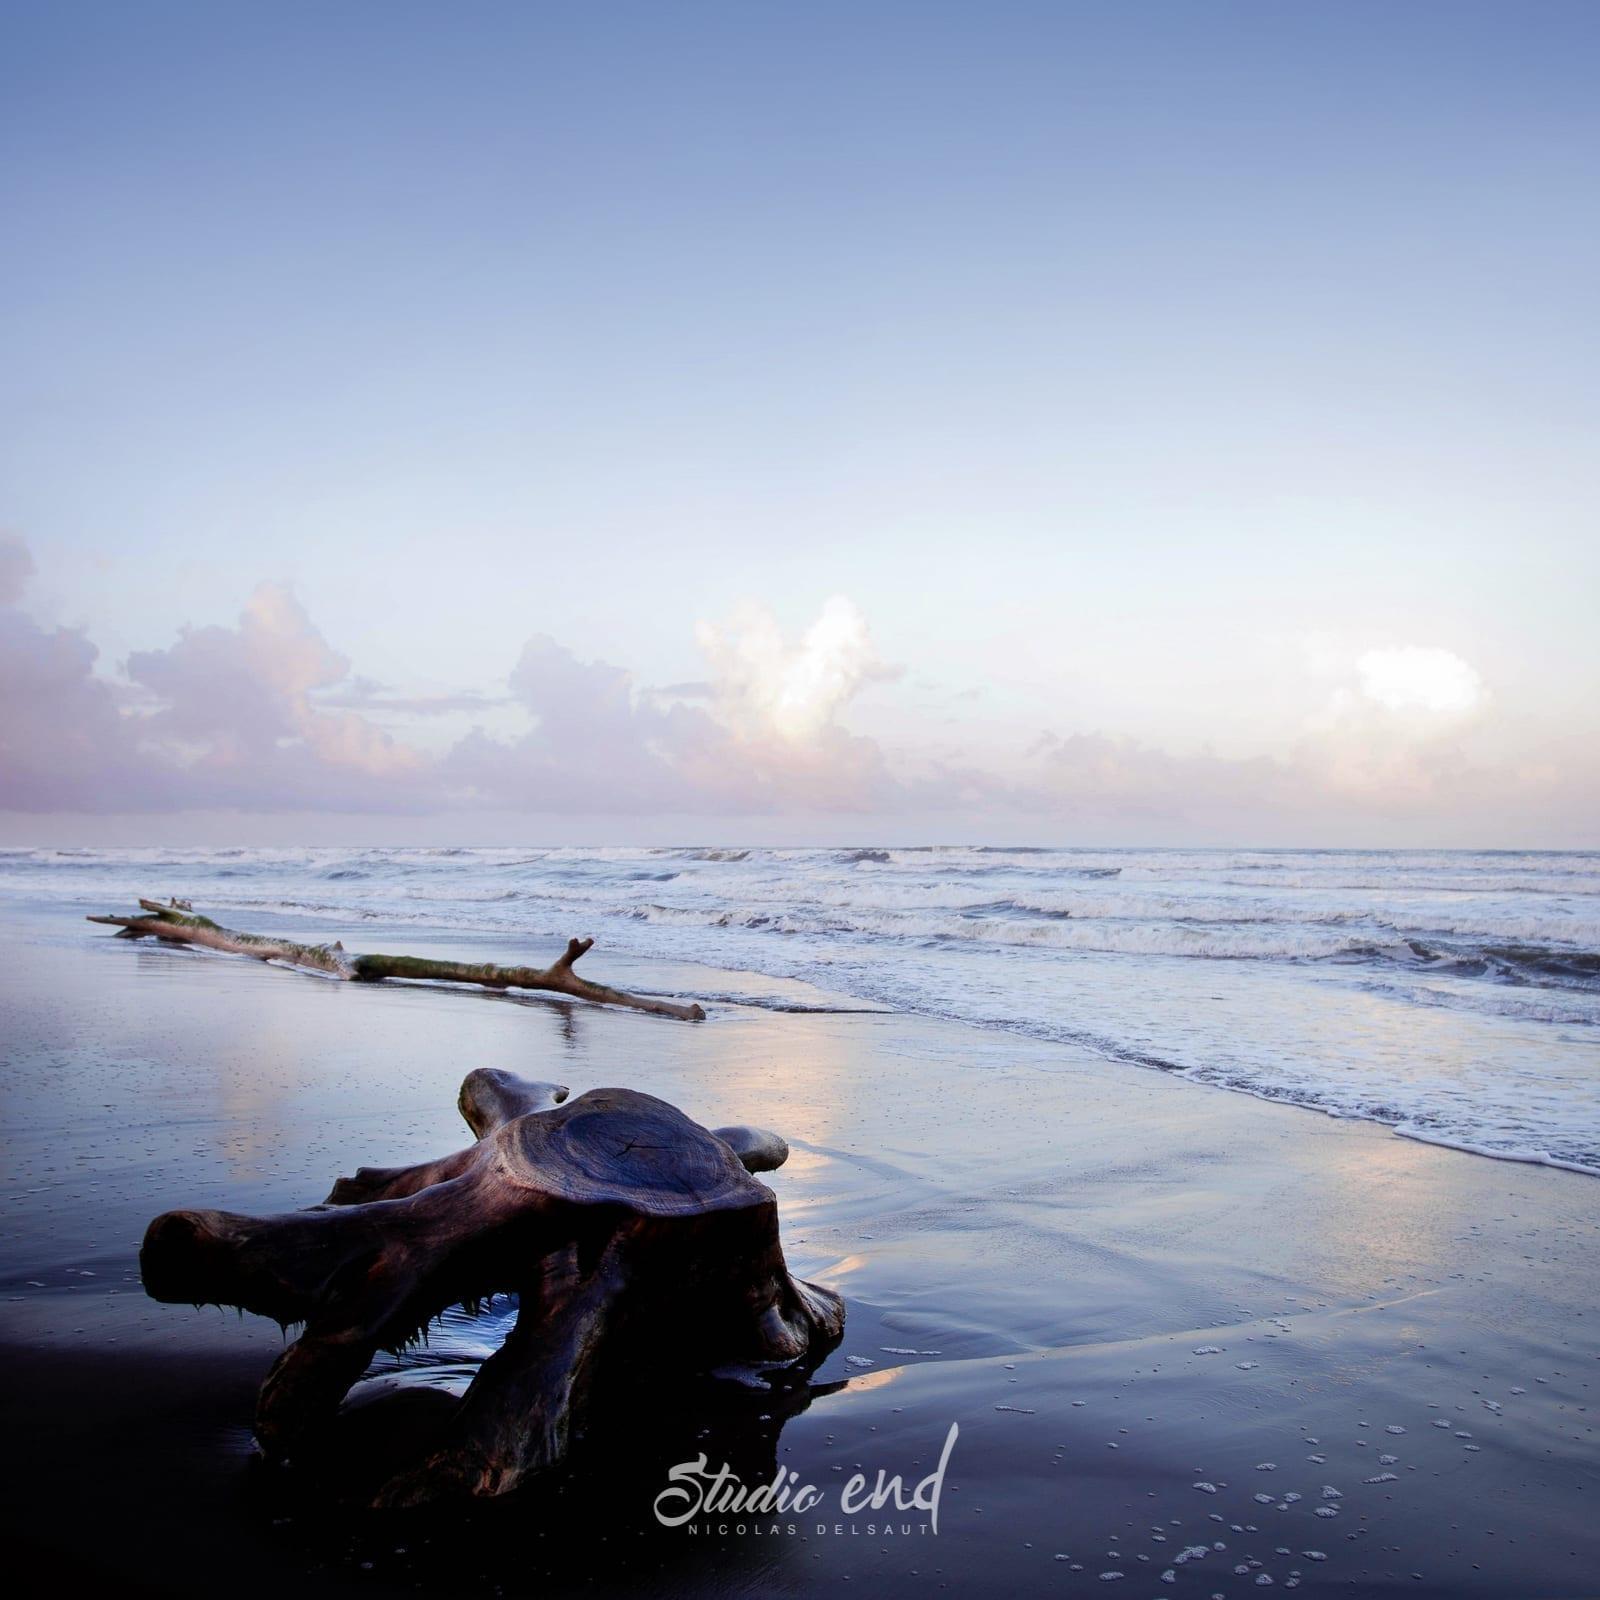 Photographie et reportage de voyage plage Costa Rica Nicolas Delsaut